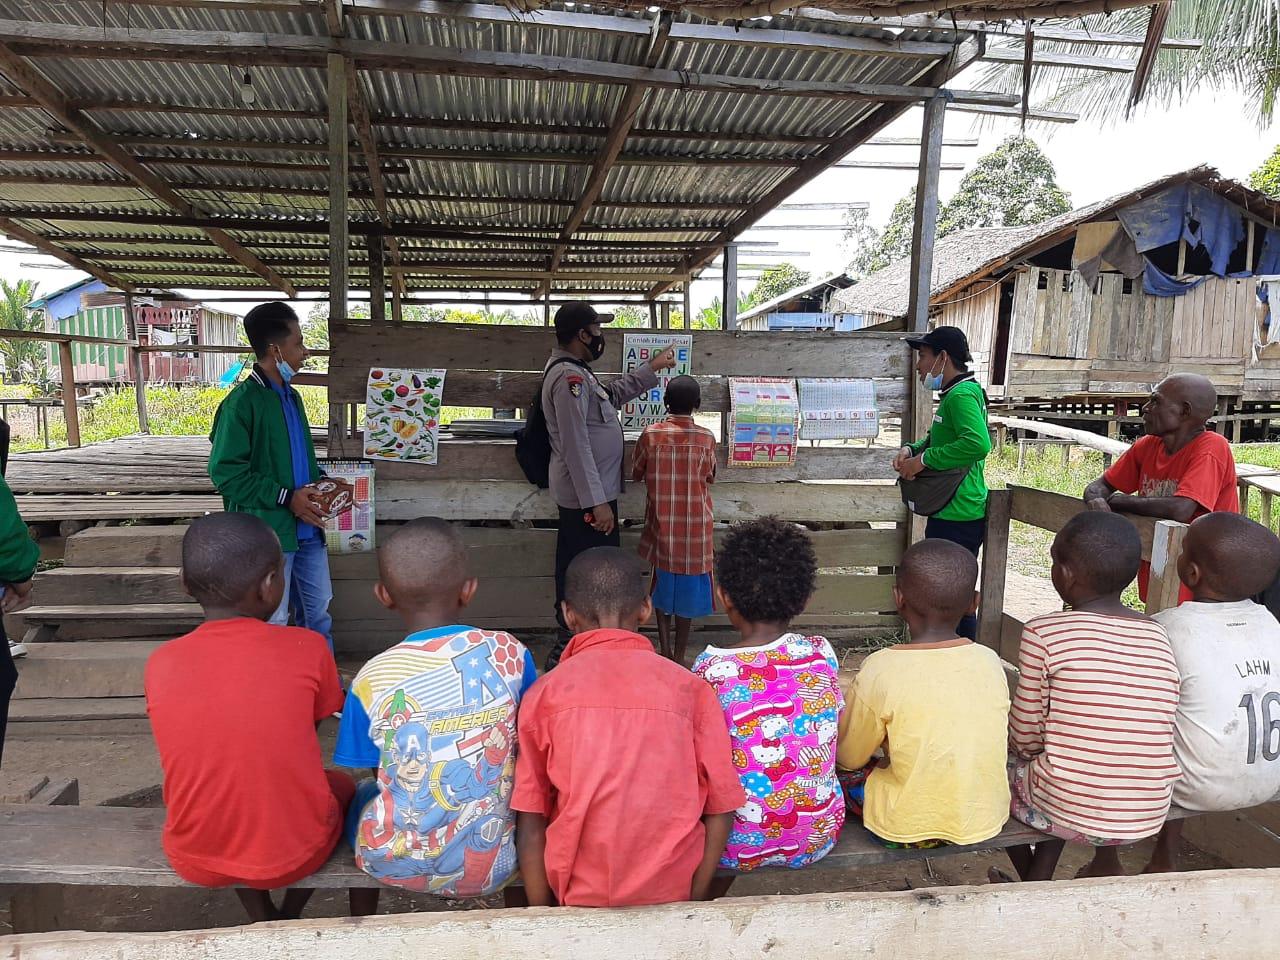 Bhabinkamtibmas Kelurahan Malasom Ajak Generasi muda  Menjadi Generasi Yang Cerdas dan berkarakter